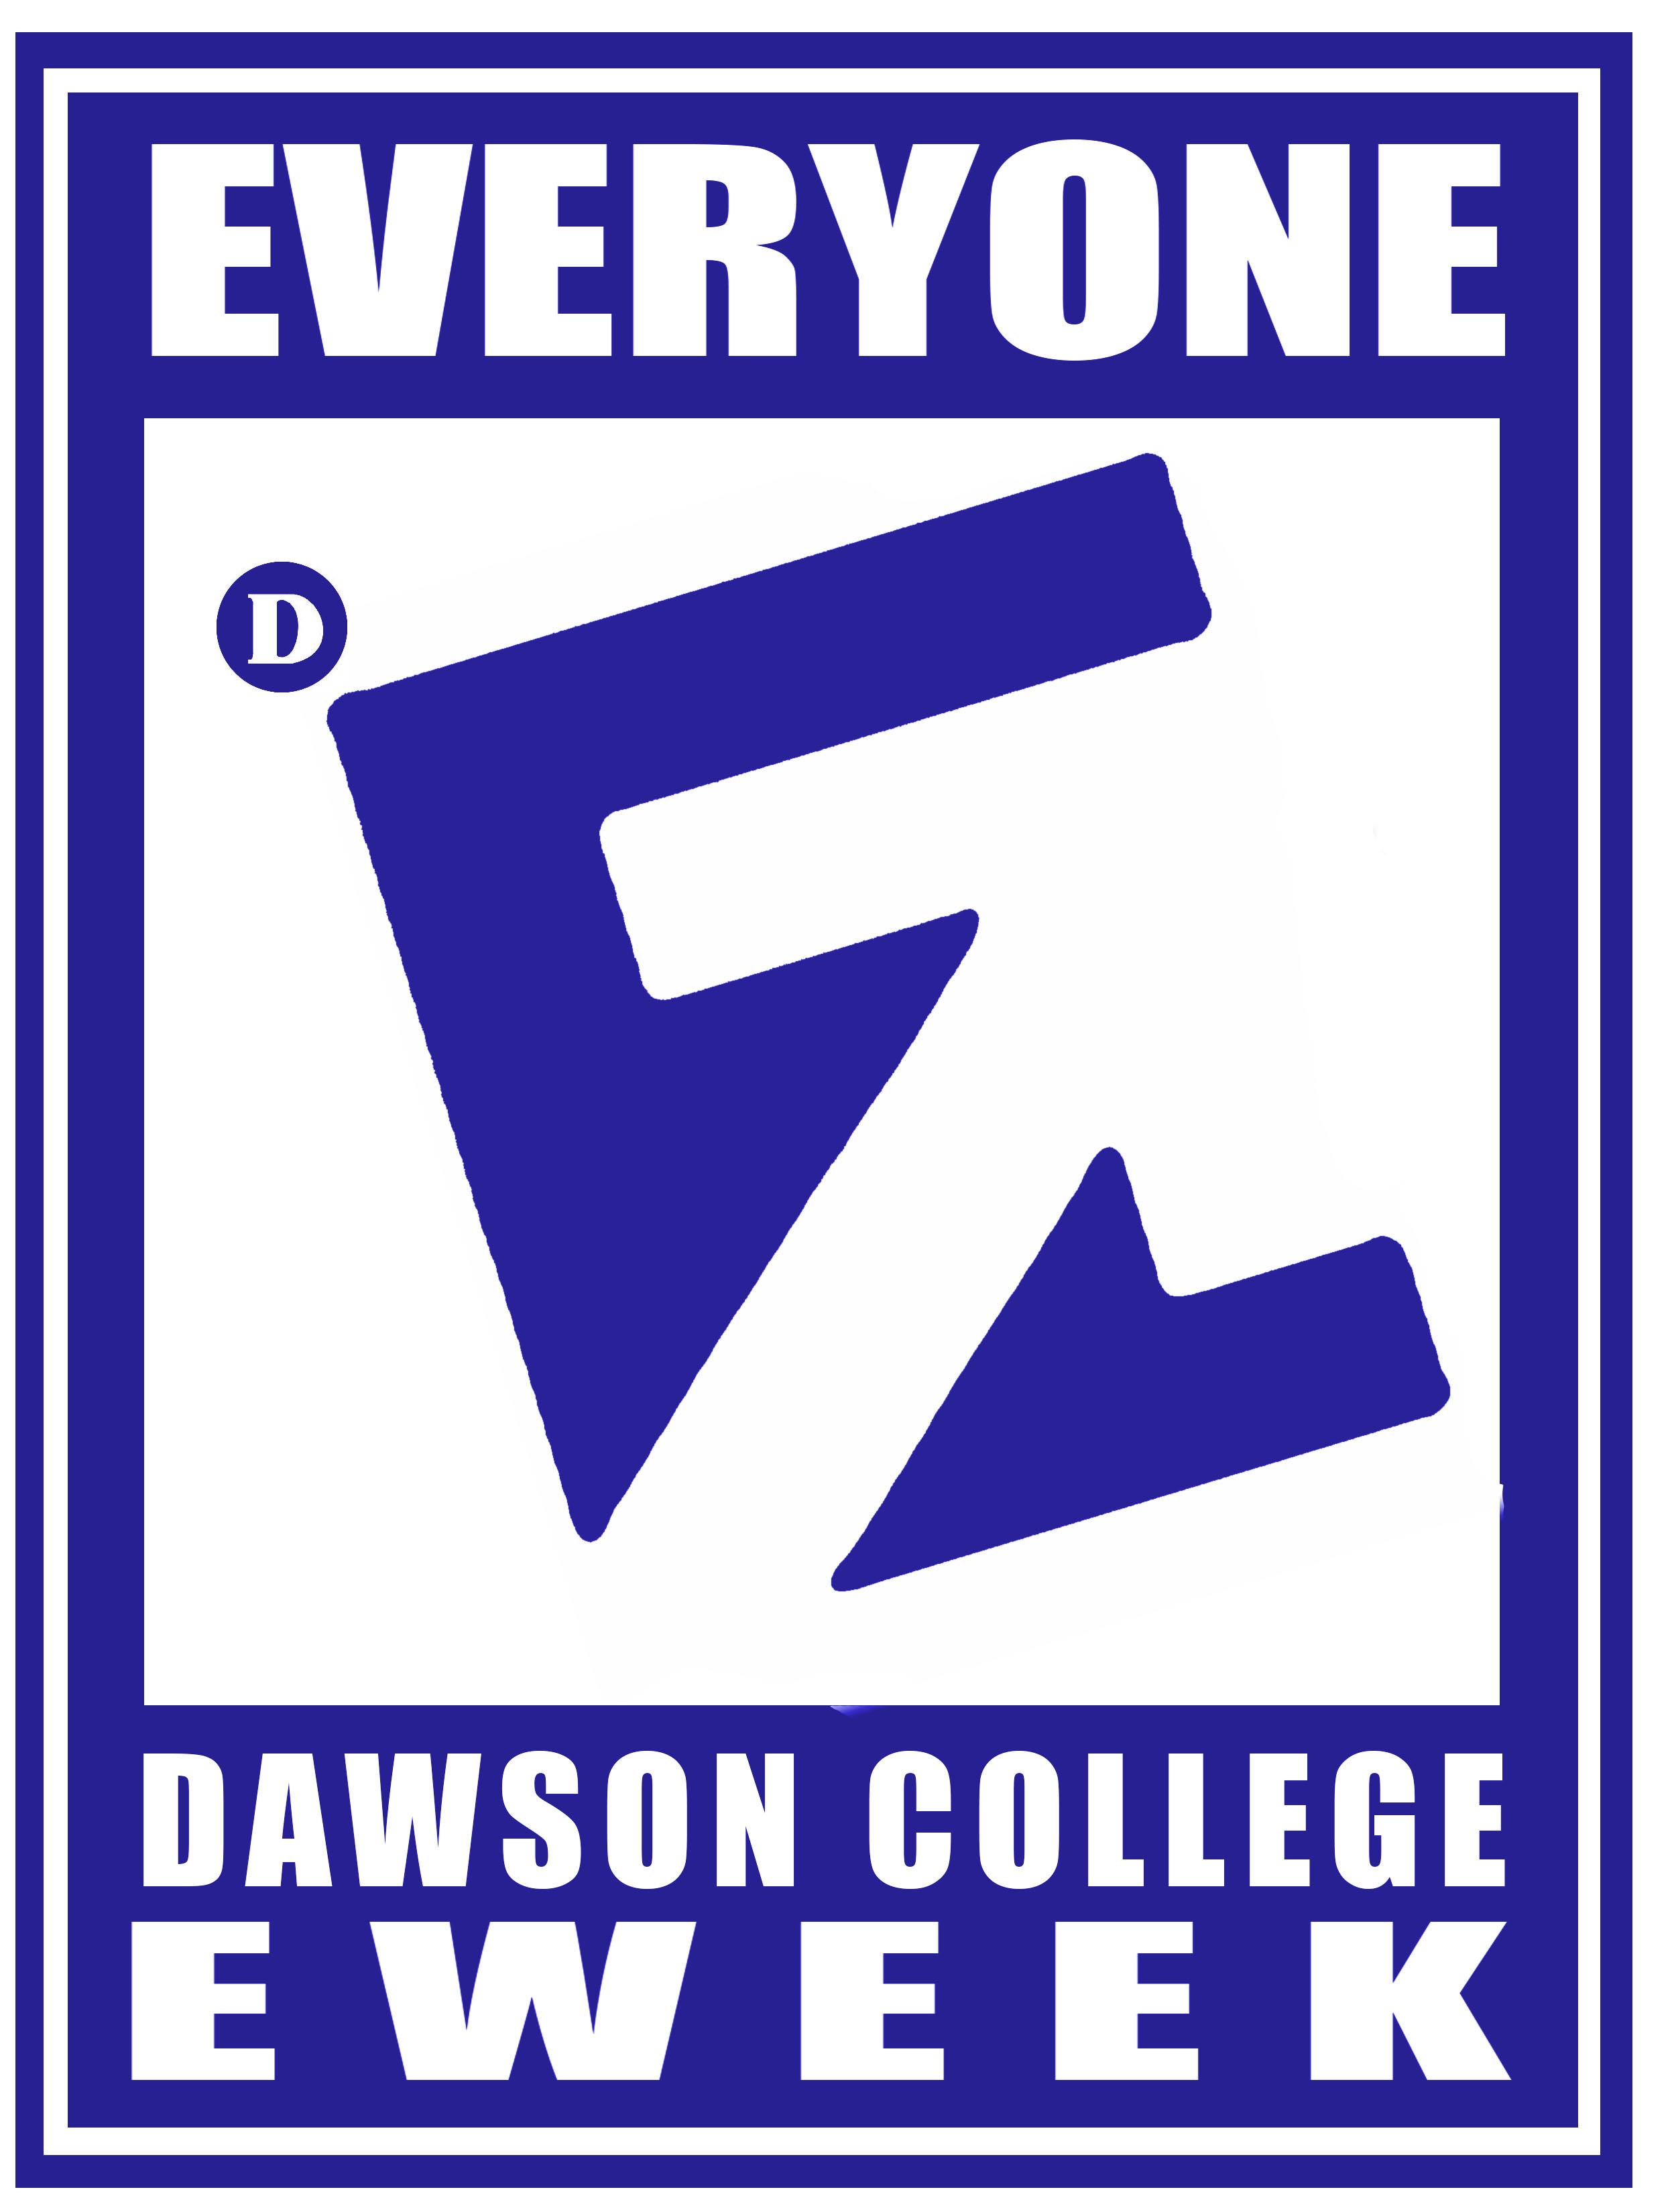 E for everyoneB.jpg